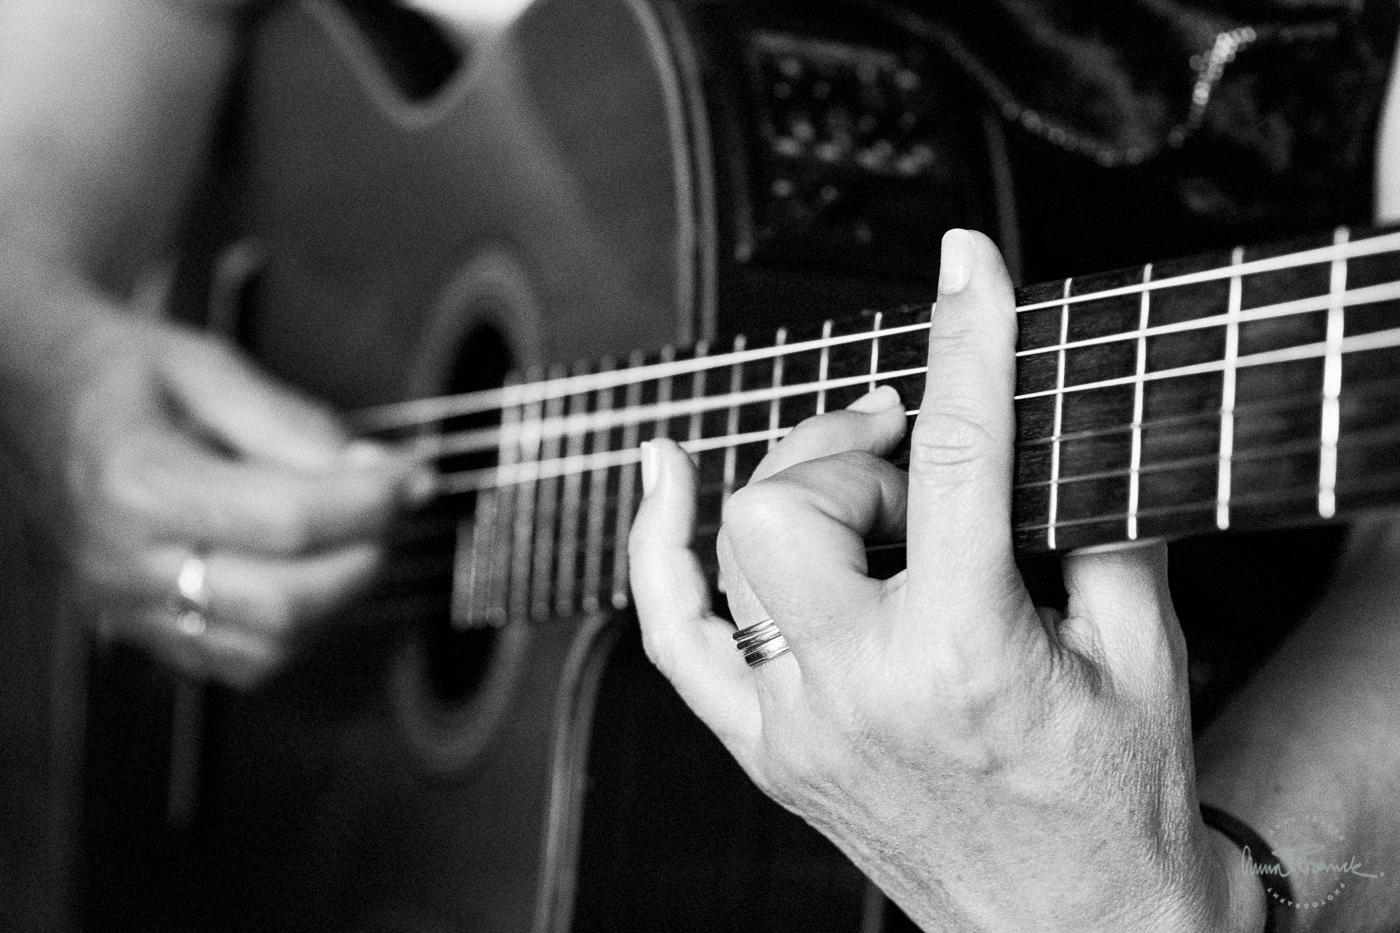 music, musicians, duo, swing, jazz, musiker, musik, musiikki, mustavalkoinen, svartvitt, vintage, oldfashioned, gammaldags, promotion, promo, konsert, gitarr, dragspel